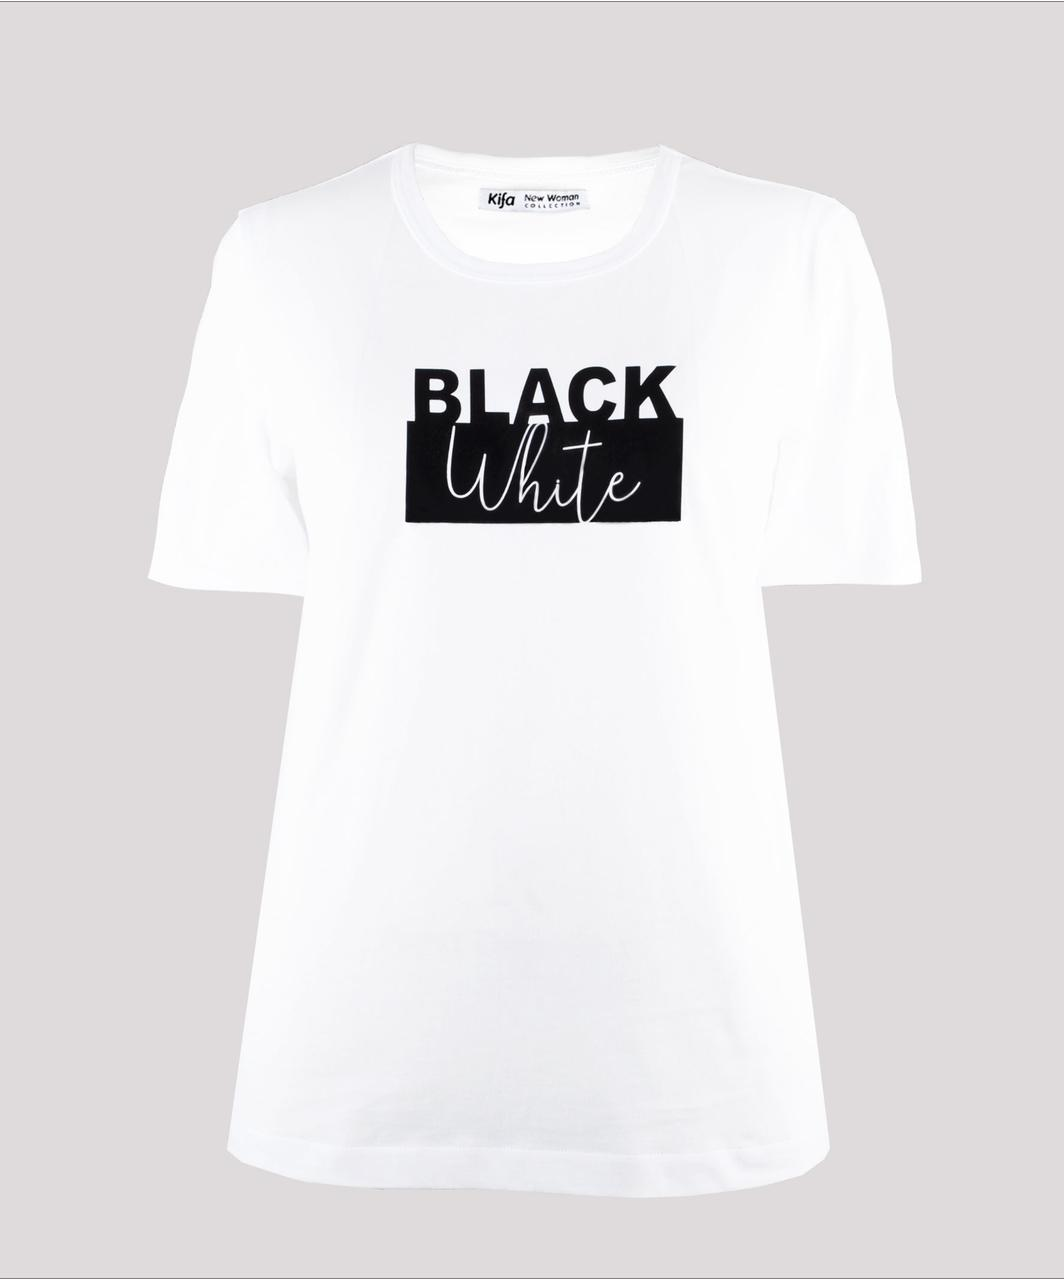 Футболка женская KIFA ФЖ-017/30 BLACK WHITE белая